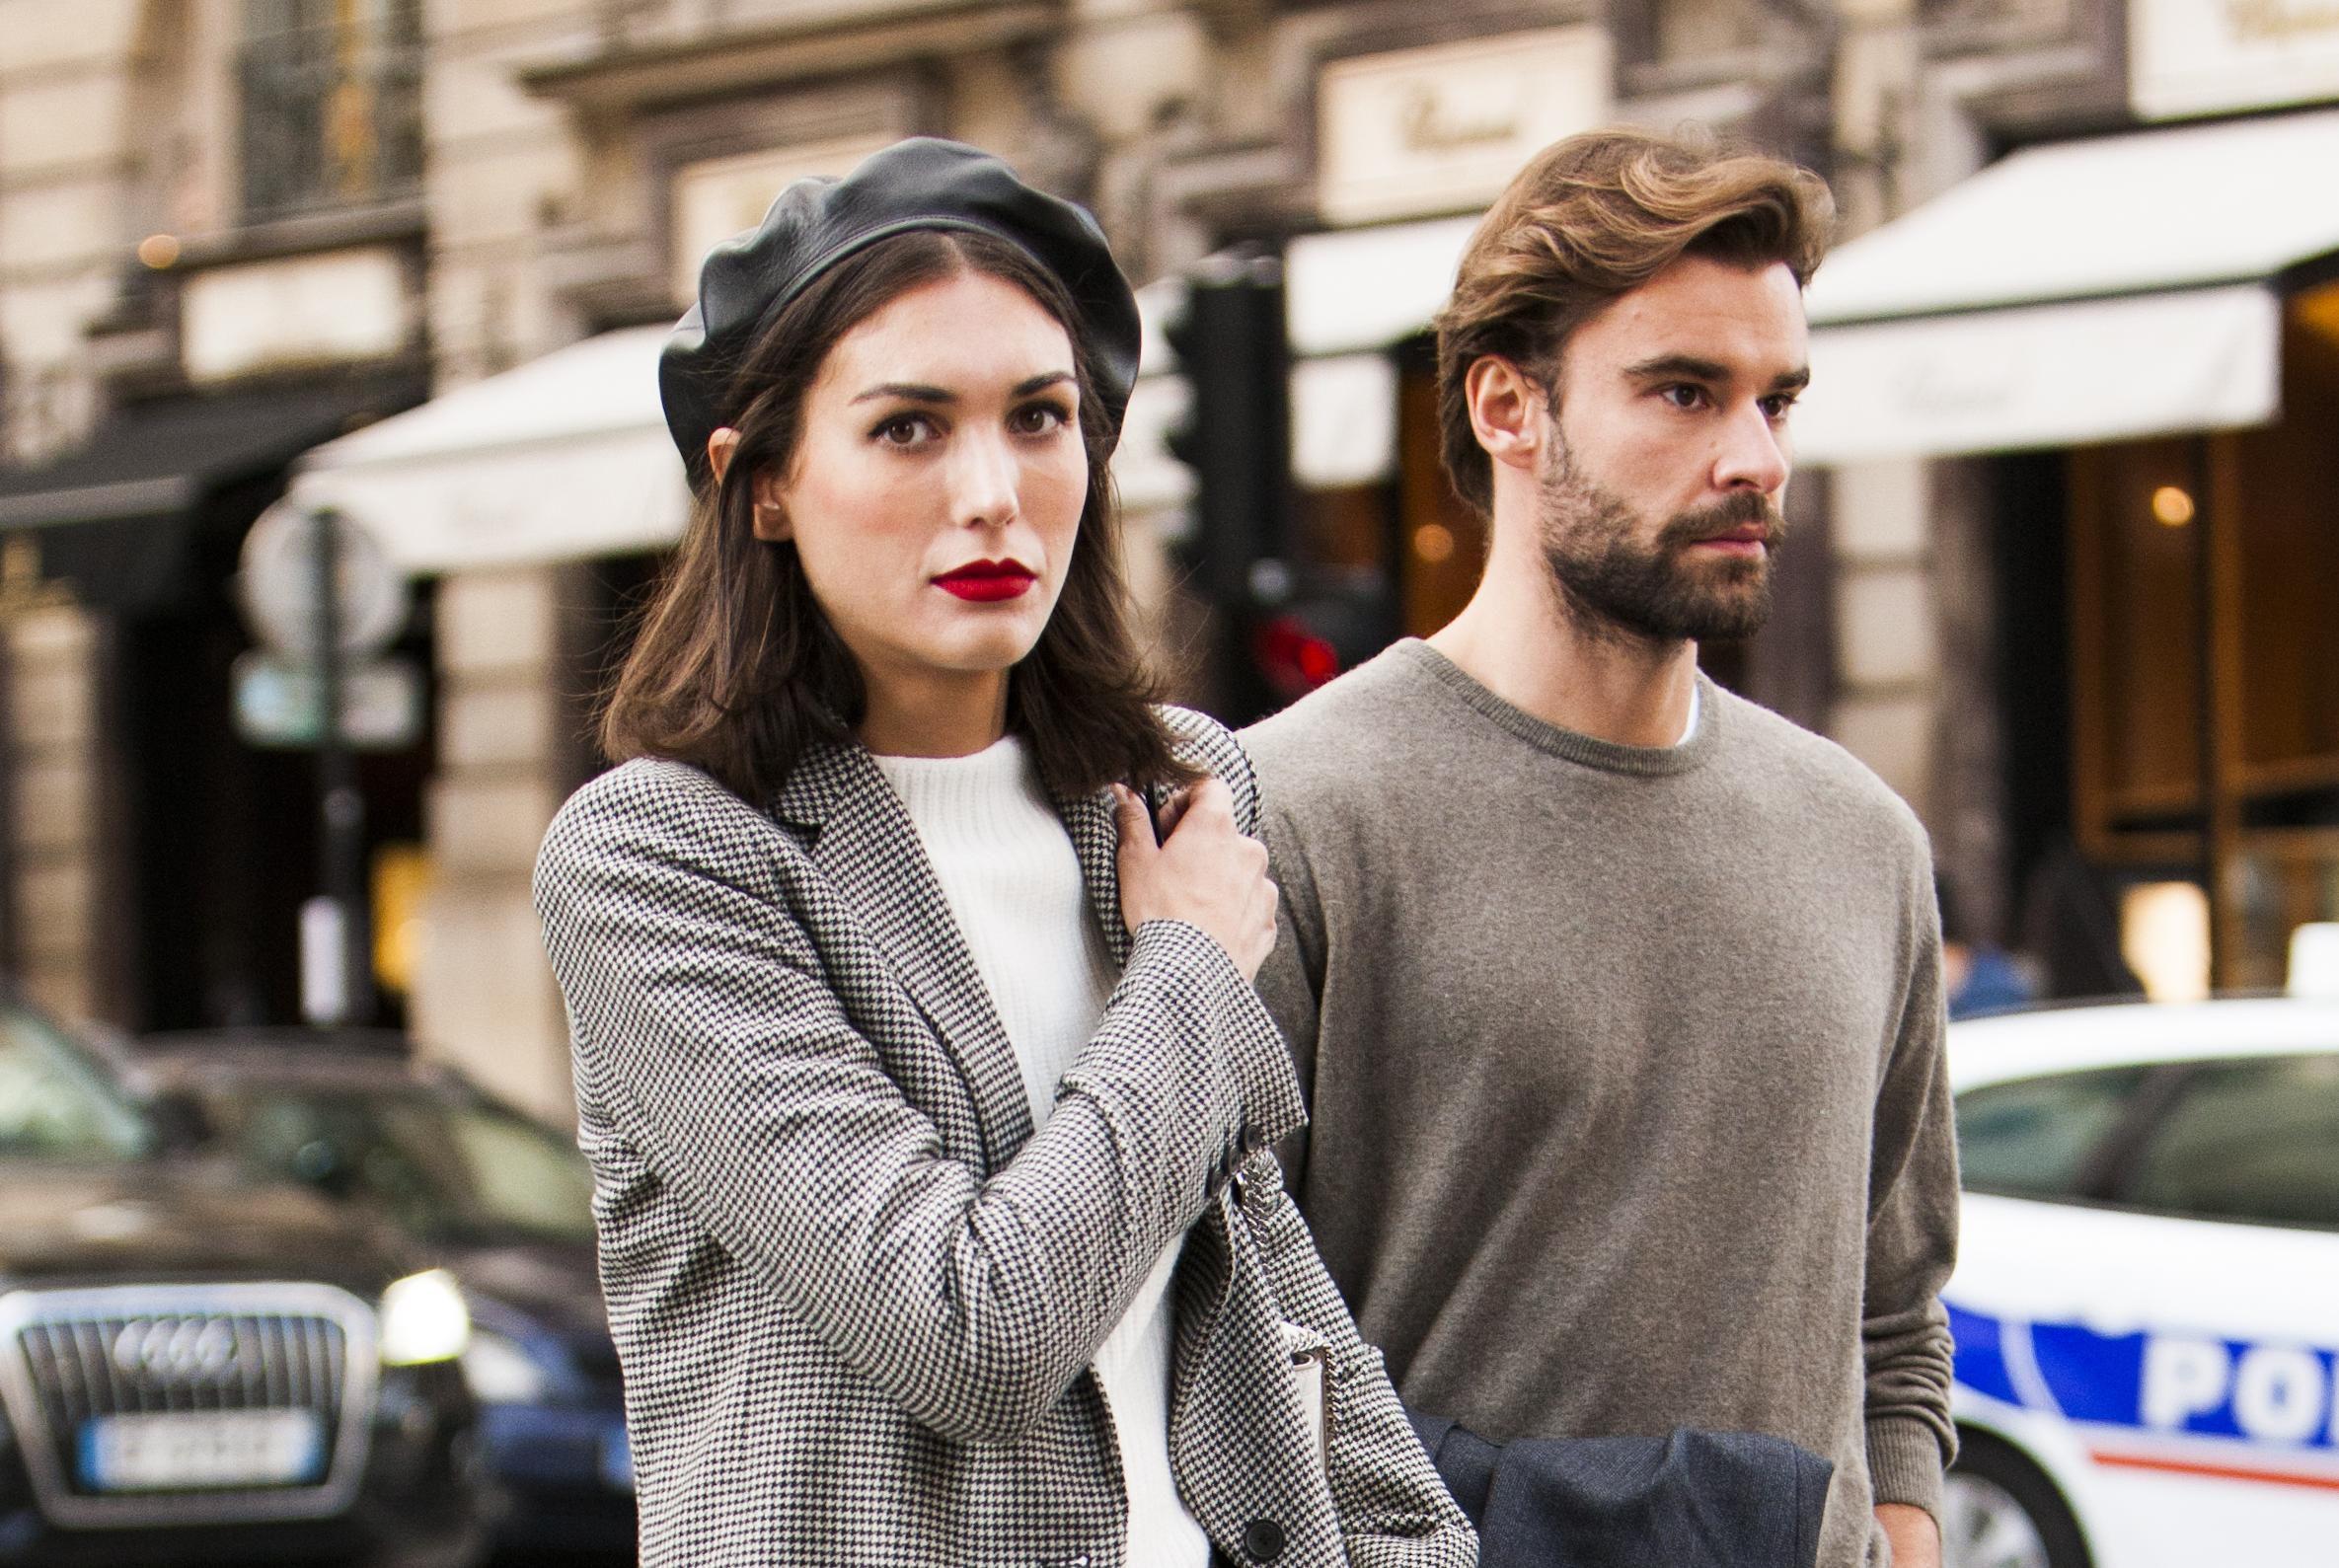 Definitivno krademo njihove ideje: Ovaj par je baš chic na pariški način!